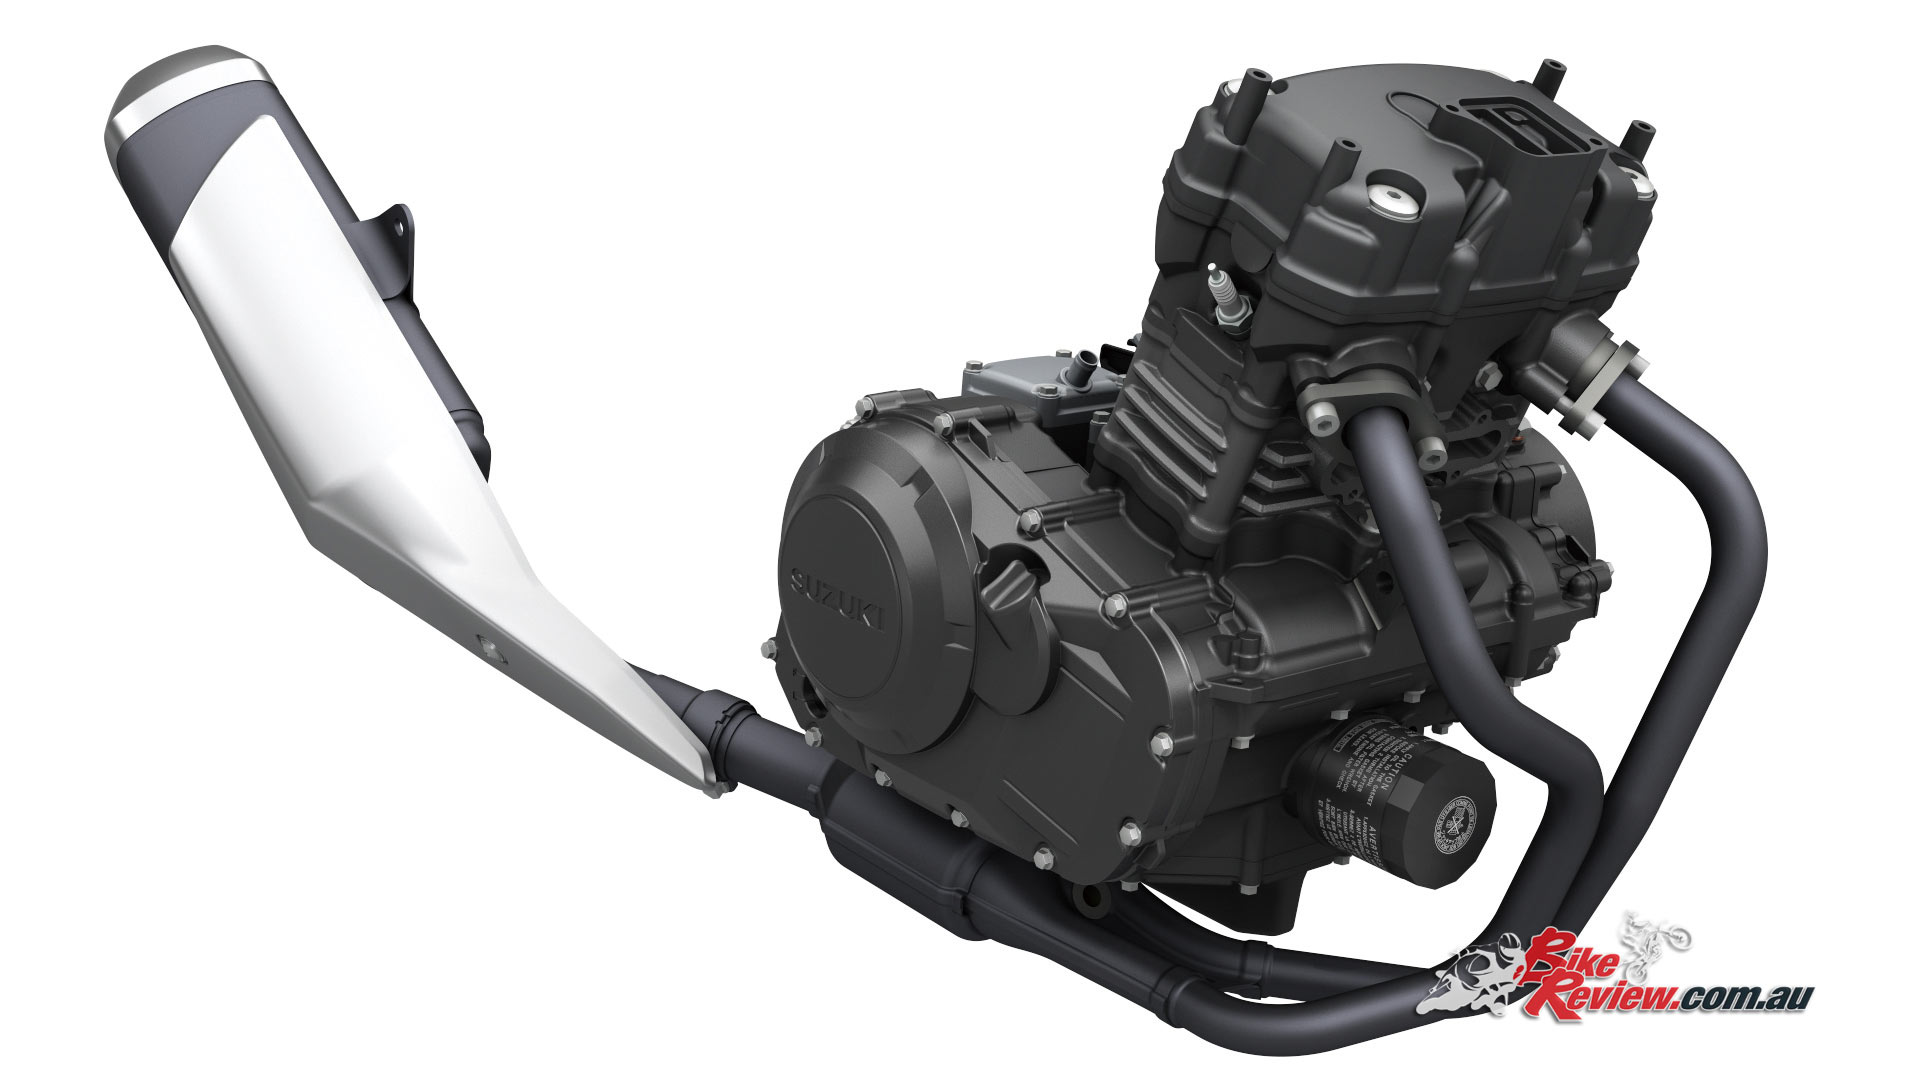 New Suzuki 250cc Motorcycles